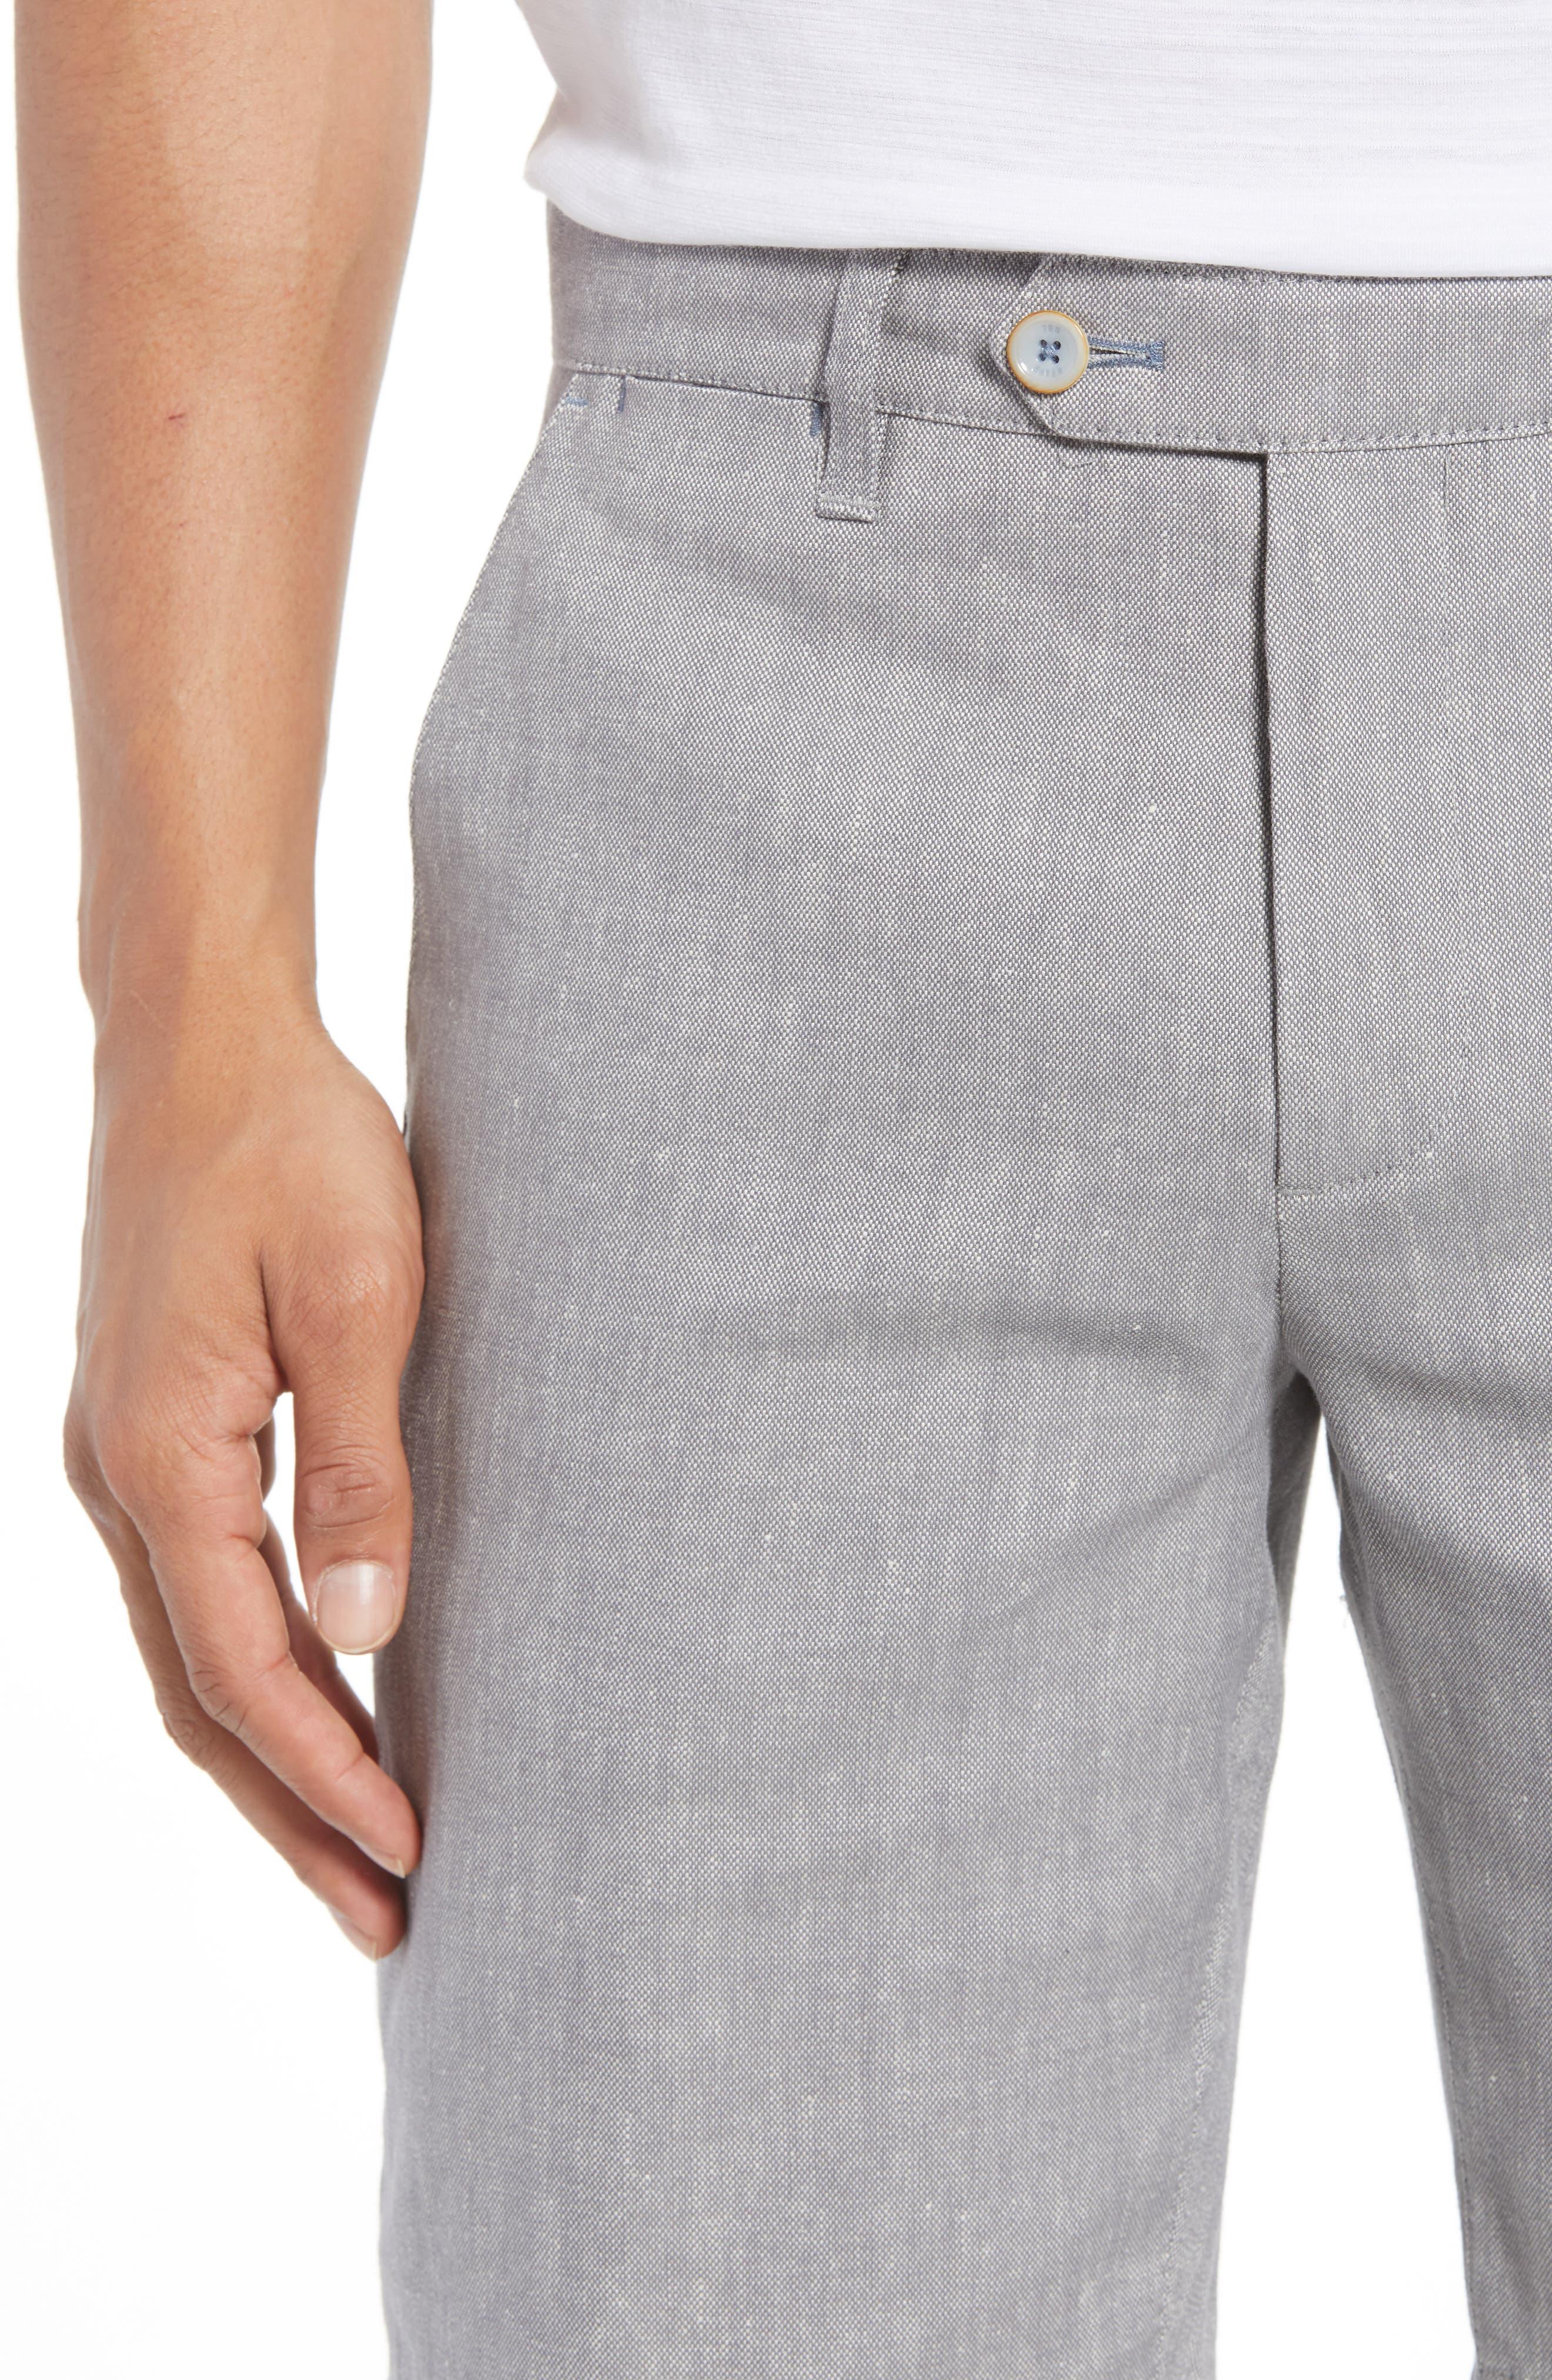 Newshow Flat Front Stretch Cotton Blend Shorts,                             Alternate thumbnail 4, color,                             GREY